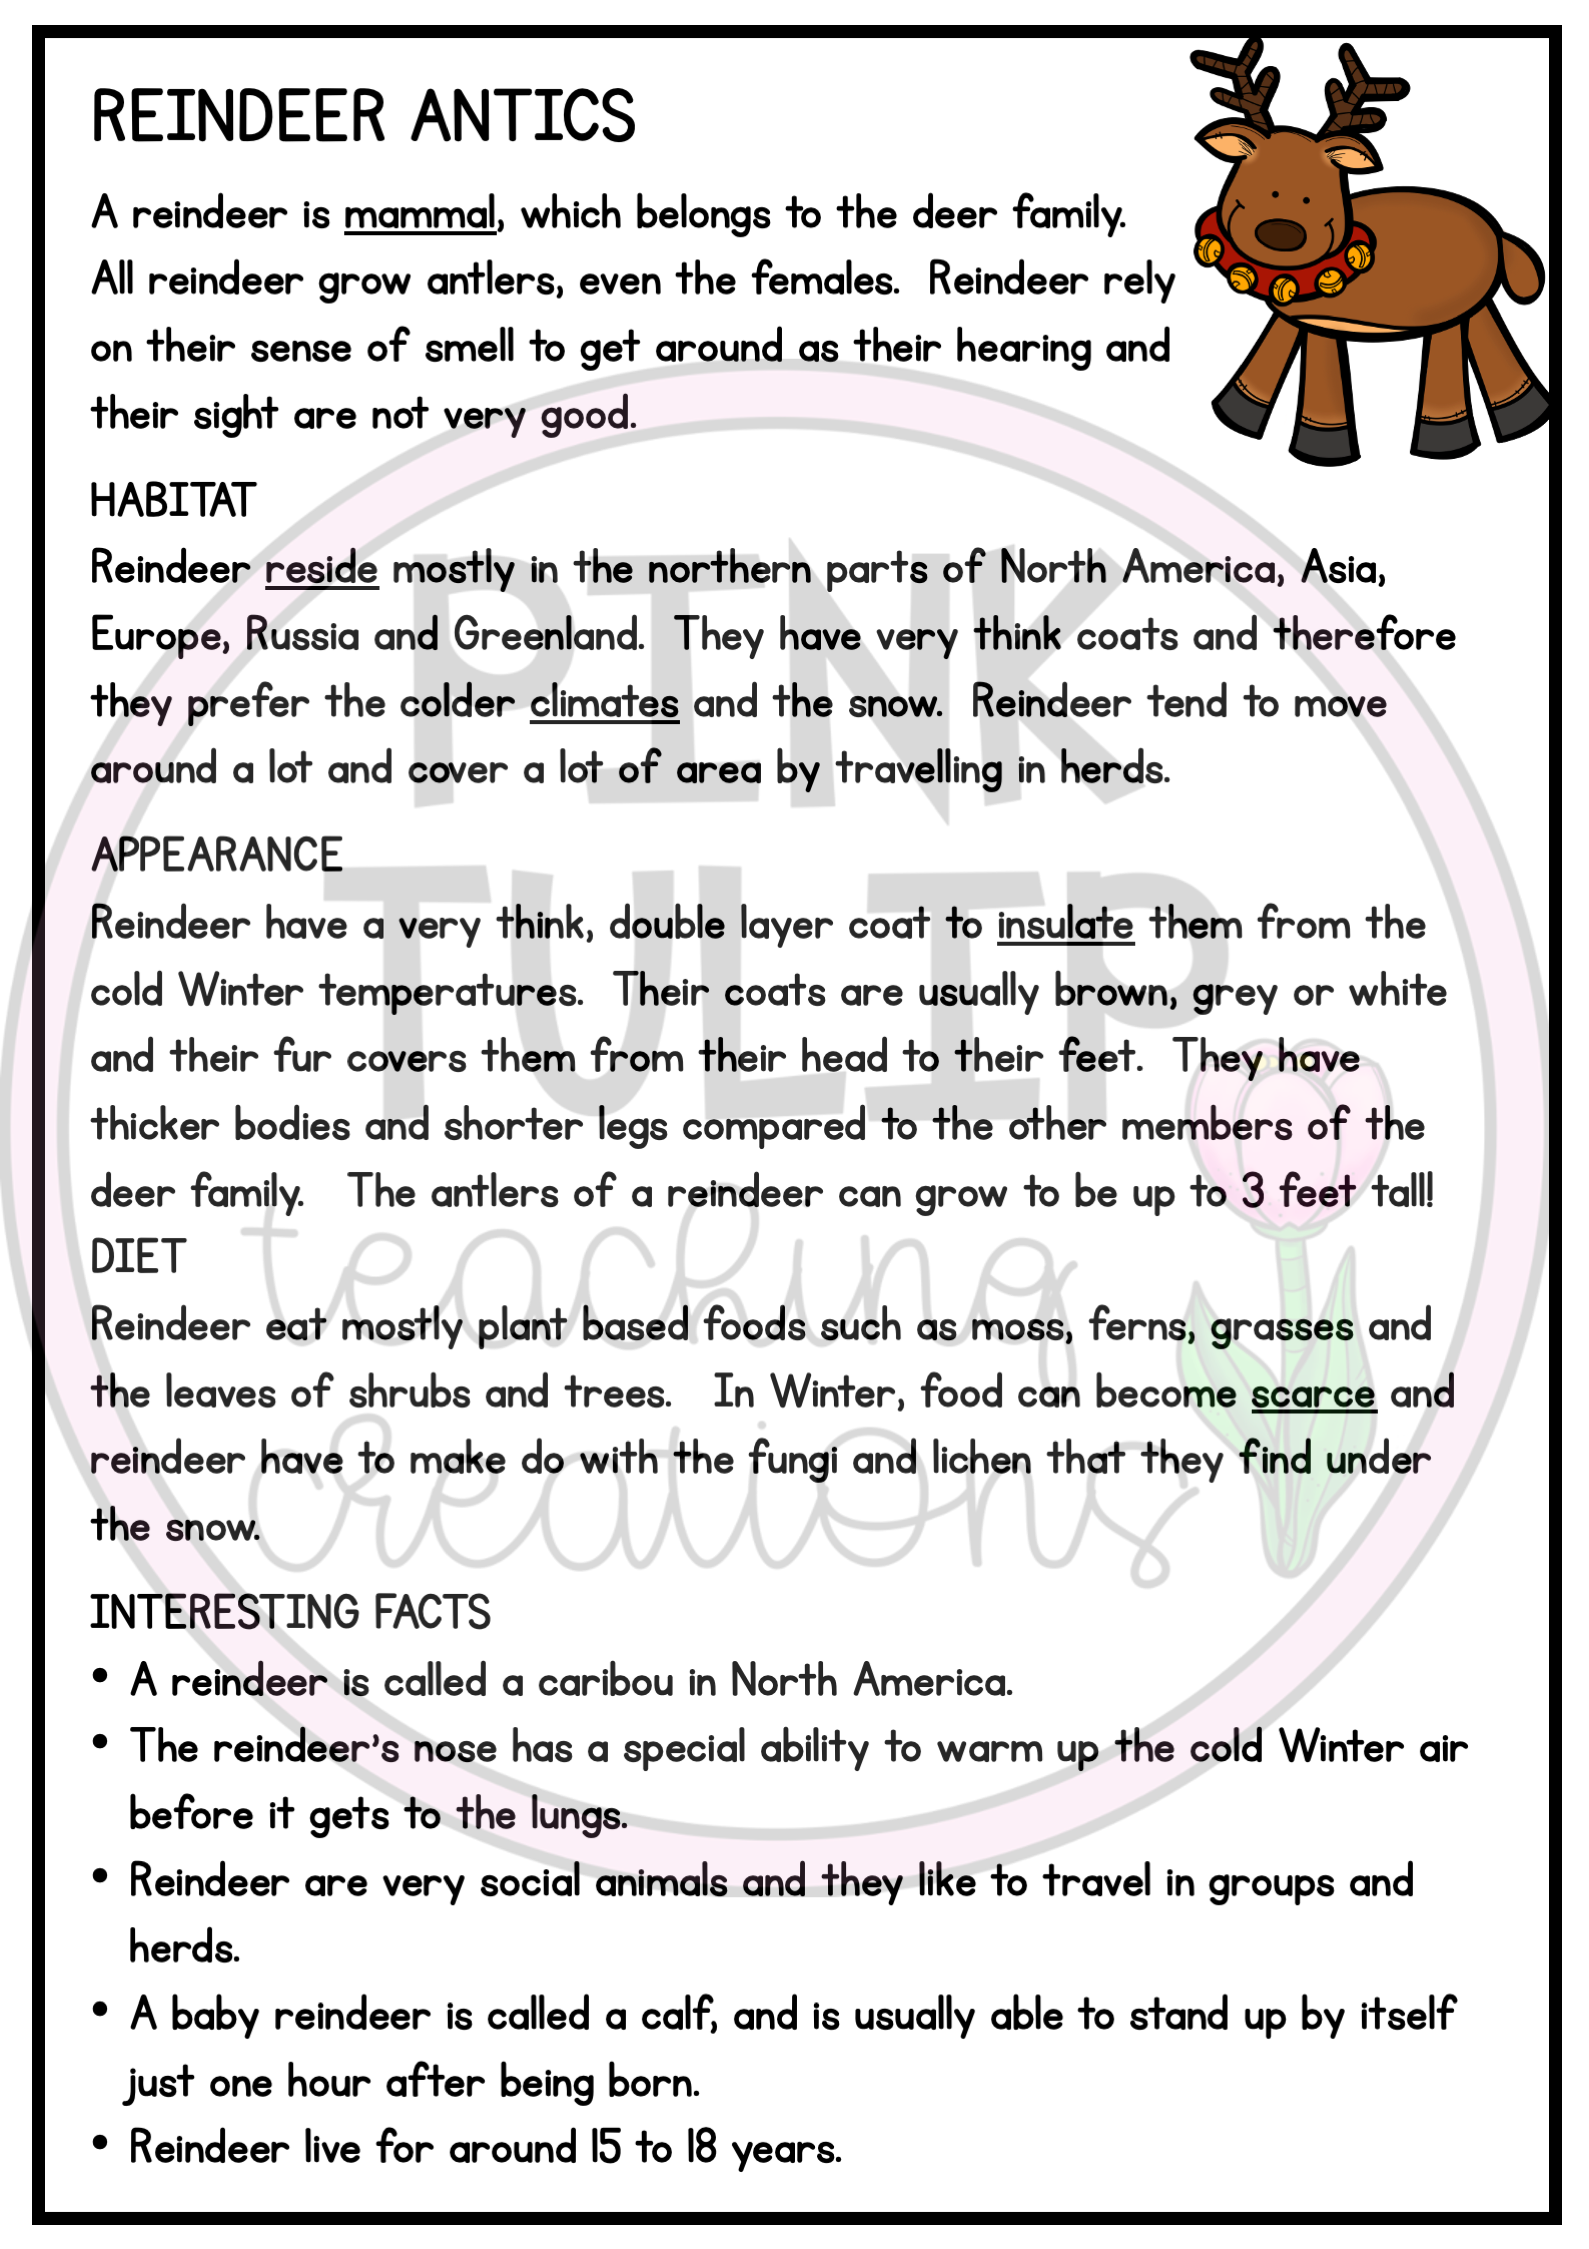 Reindeer Antics Christmas Comprehension - Reading Strategy Worksheet    Reading strategies [ 2249 x 1589 Pixel ]